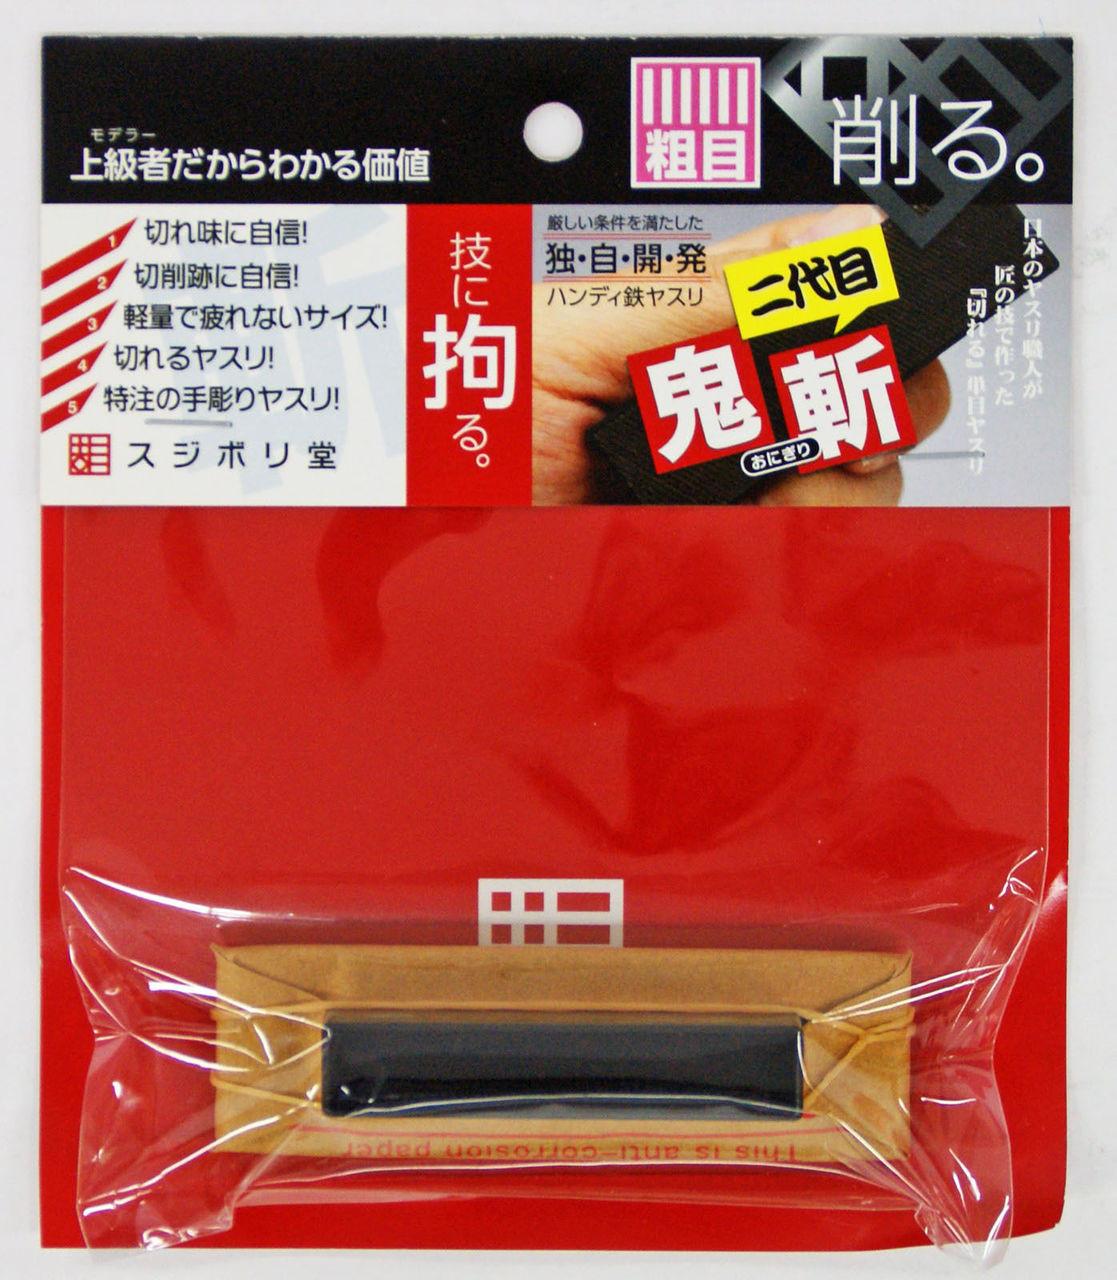 Sujiborido Onigiri Second Coarse Single Cut Handy Iron File Japan Quality 122470